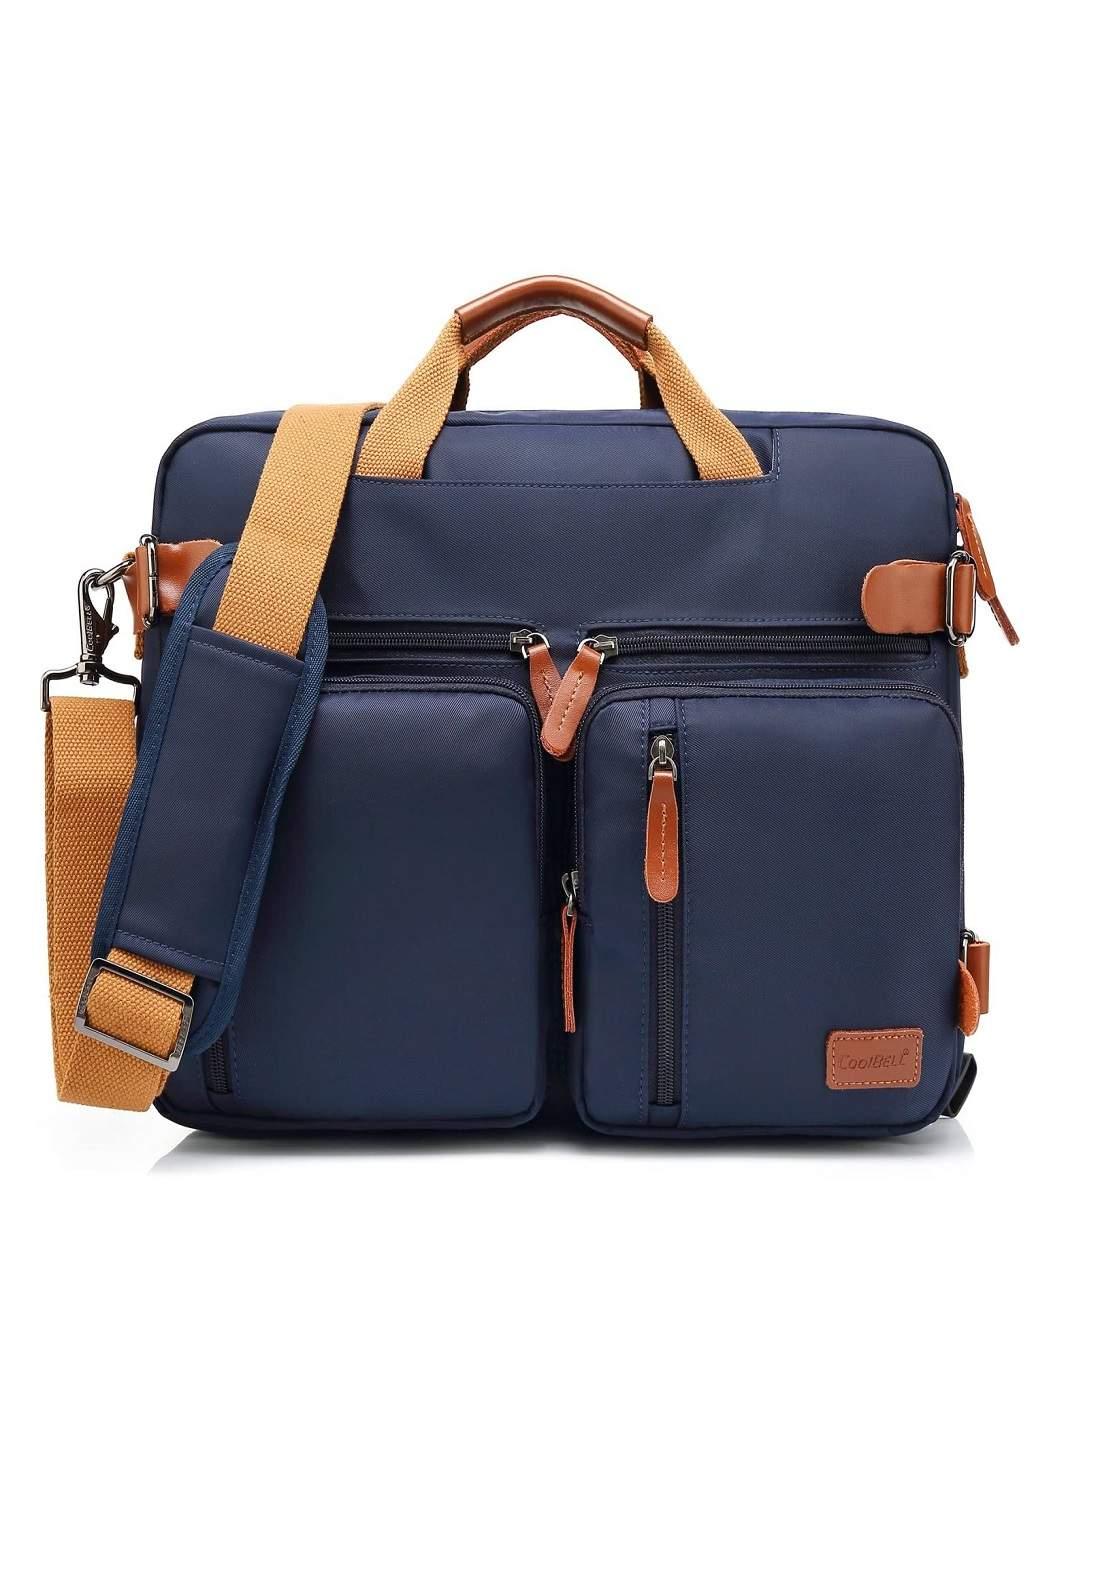 CoolBell CB-5005 Laptop Bag-Blue حقيبة لابتوب